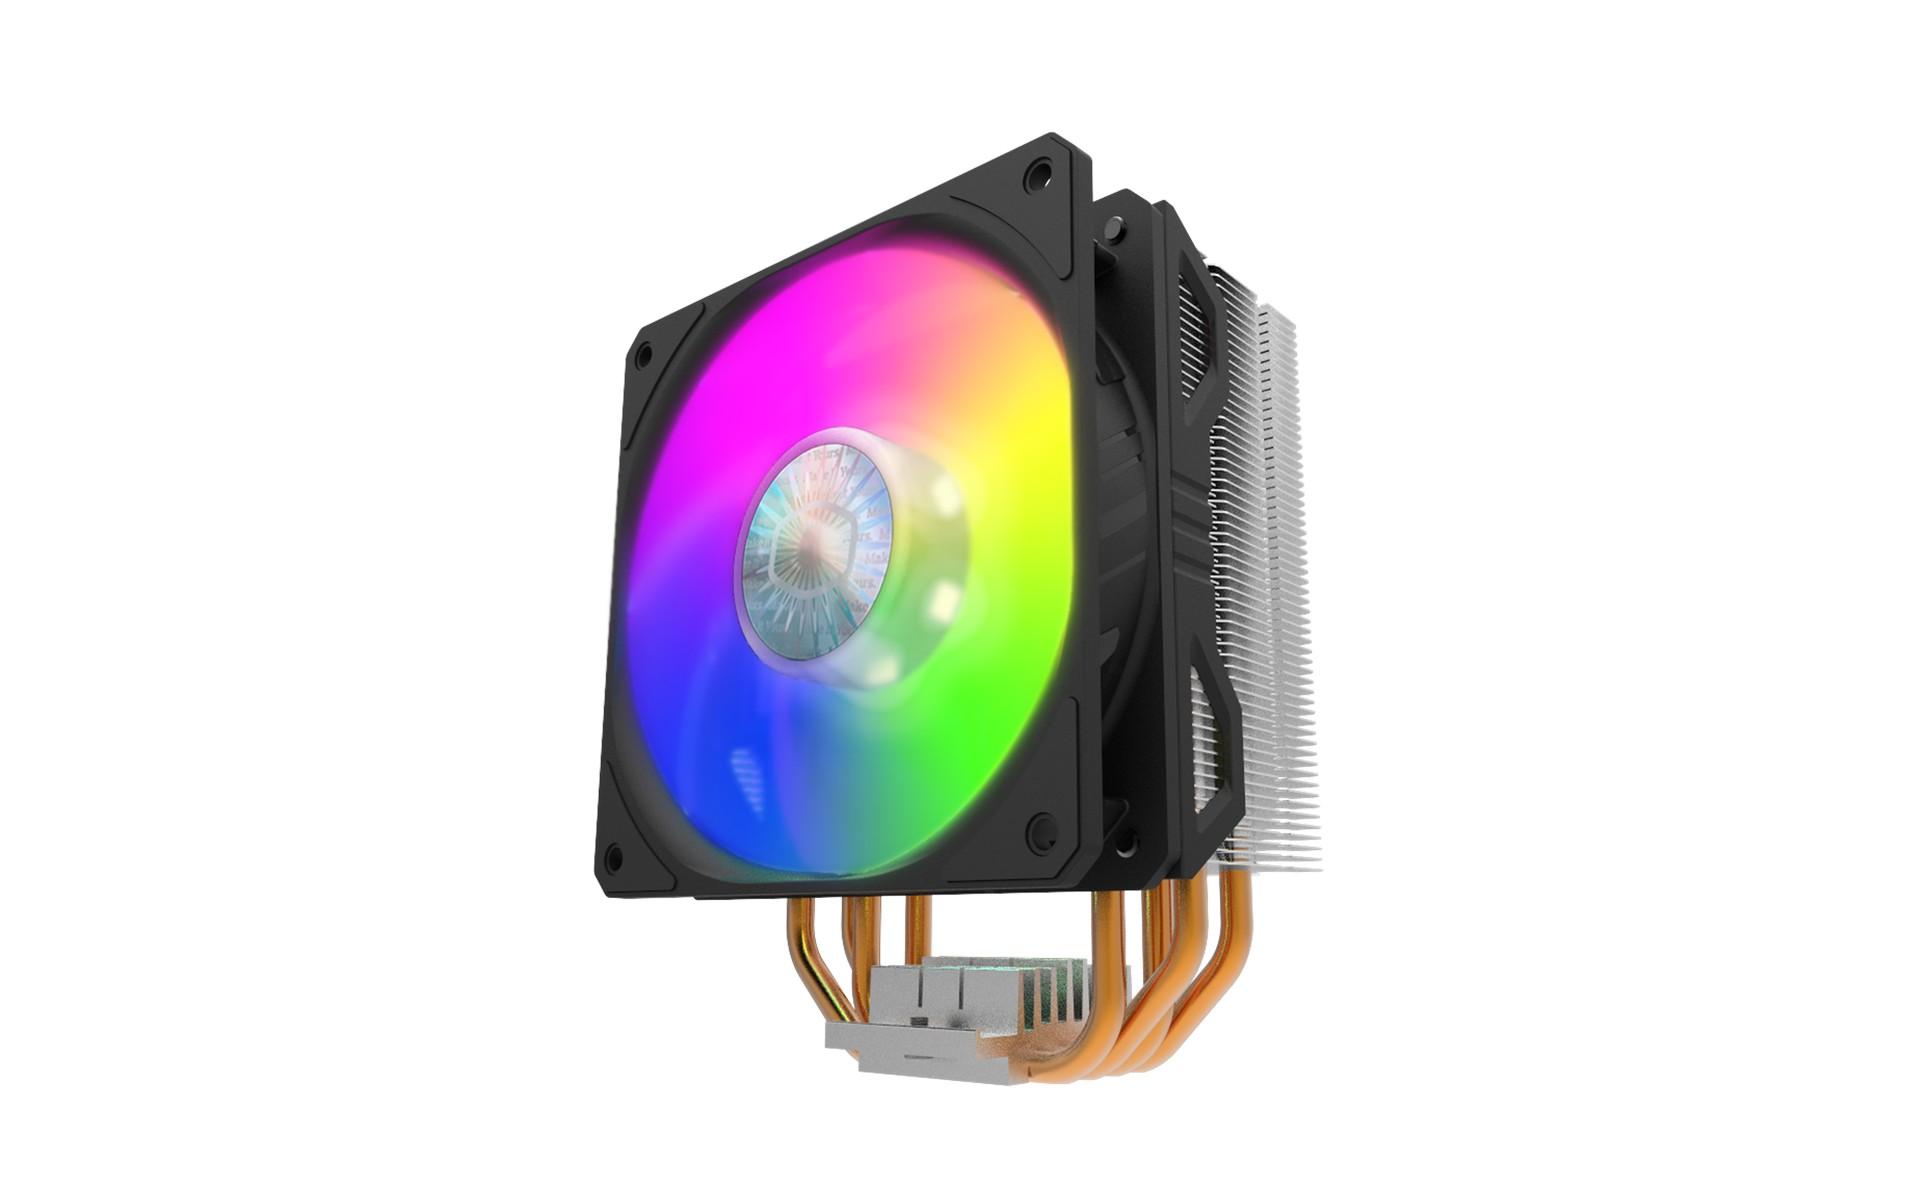 Cooler Master Hyper 212 Spectrum V2